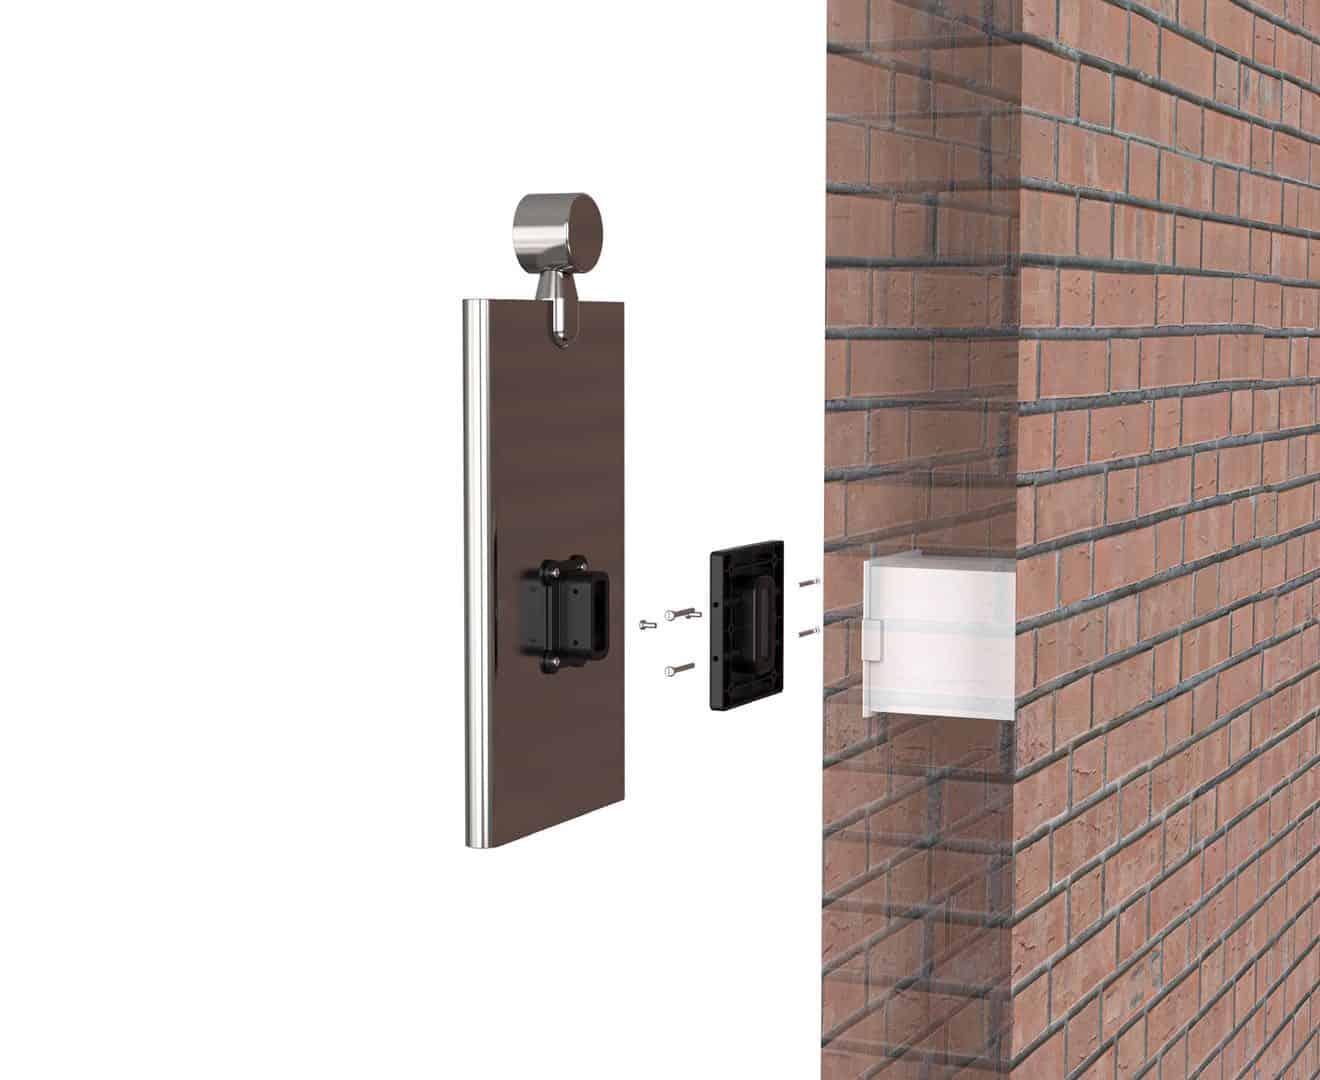 camara-termica-control-acceso2